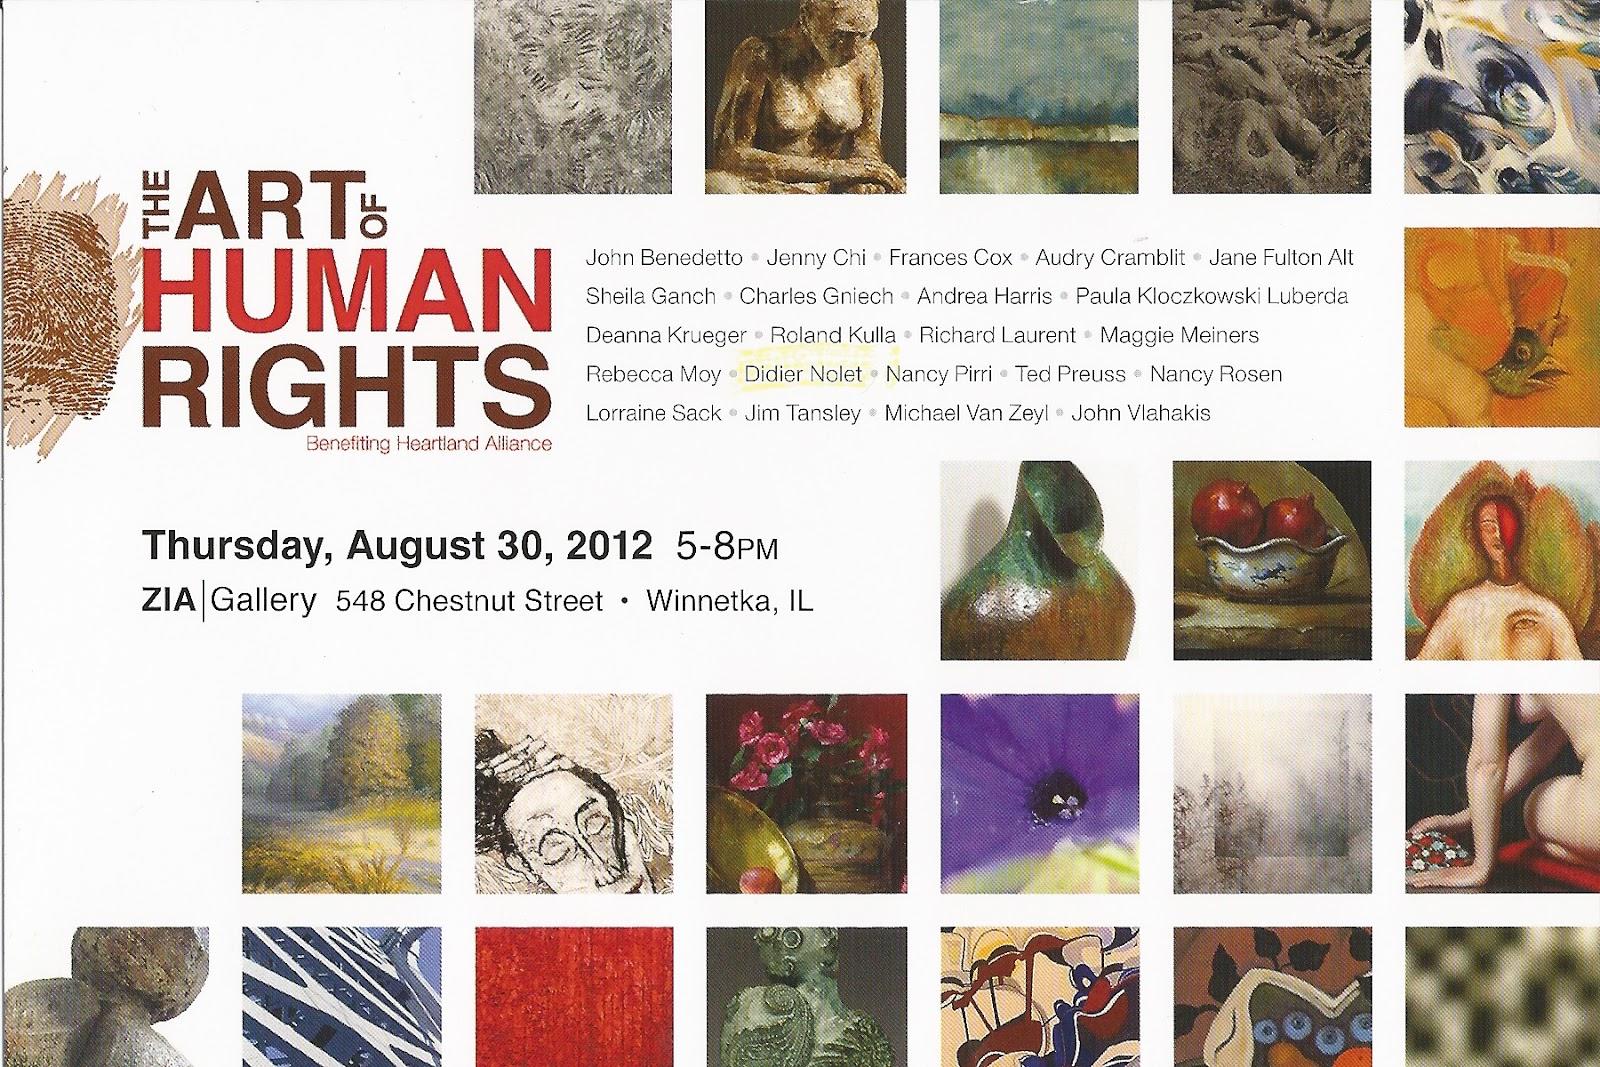 meet the fockers artists simply human